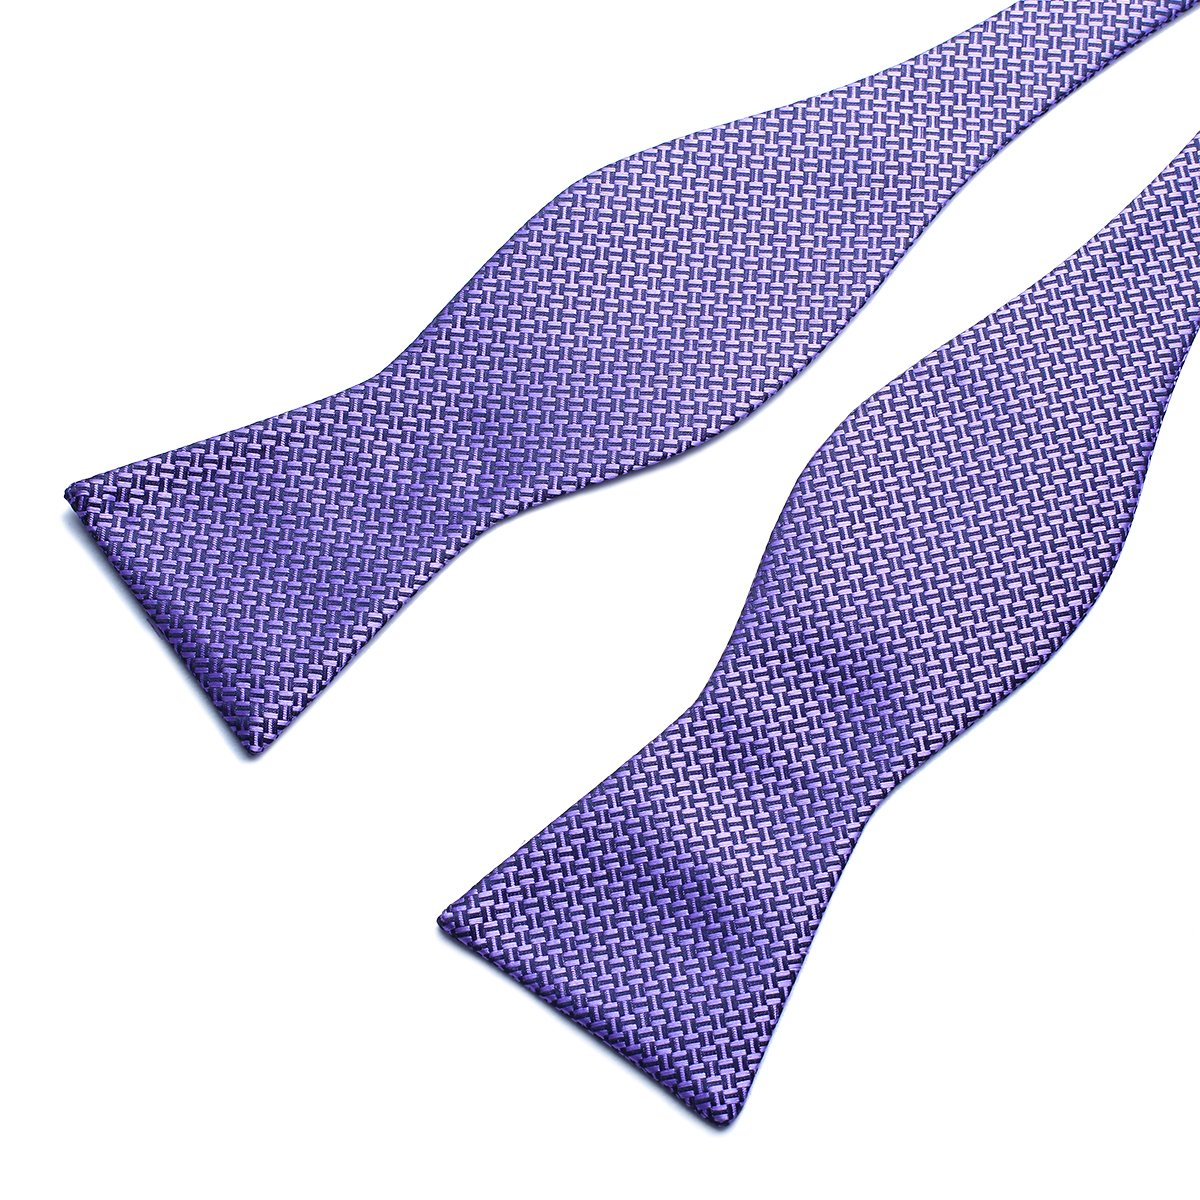 Anovaties Mens Plain Self Bow Tie Plaids Stripes Woven Silk Bow Ties-Various Colors